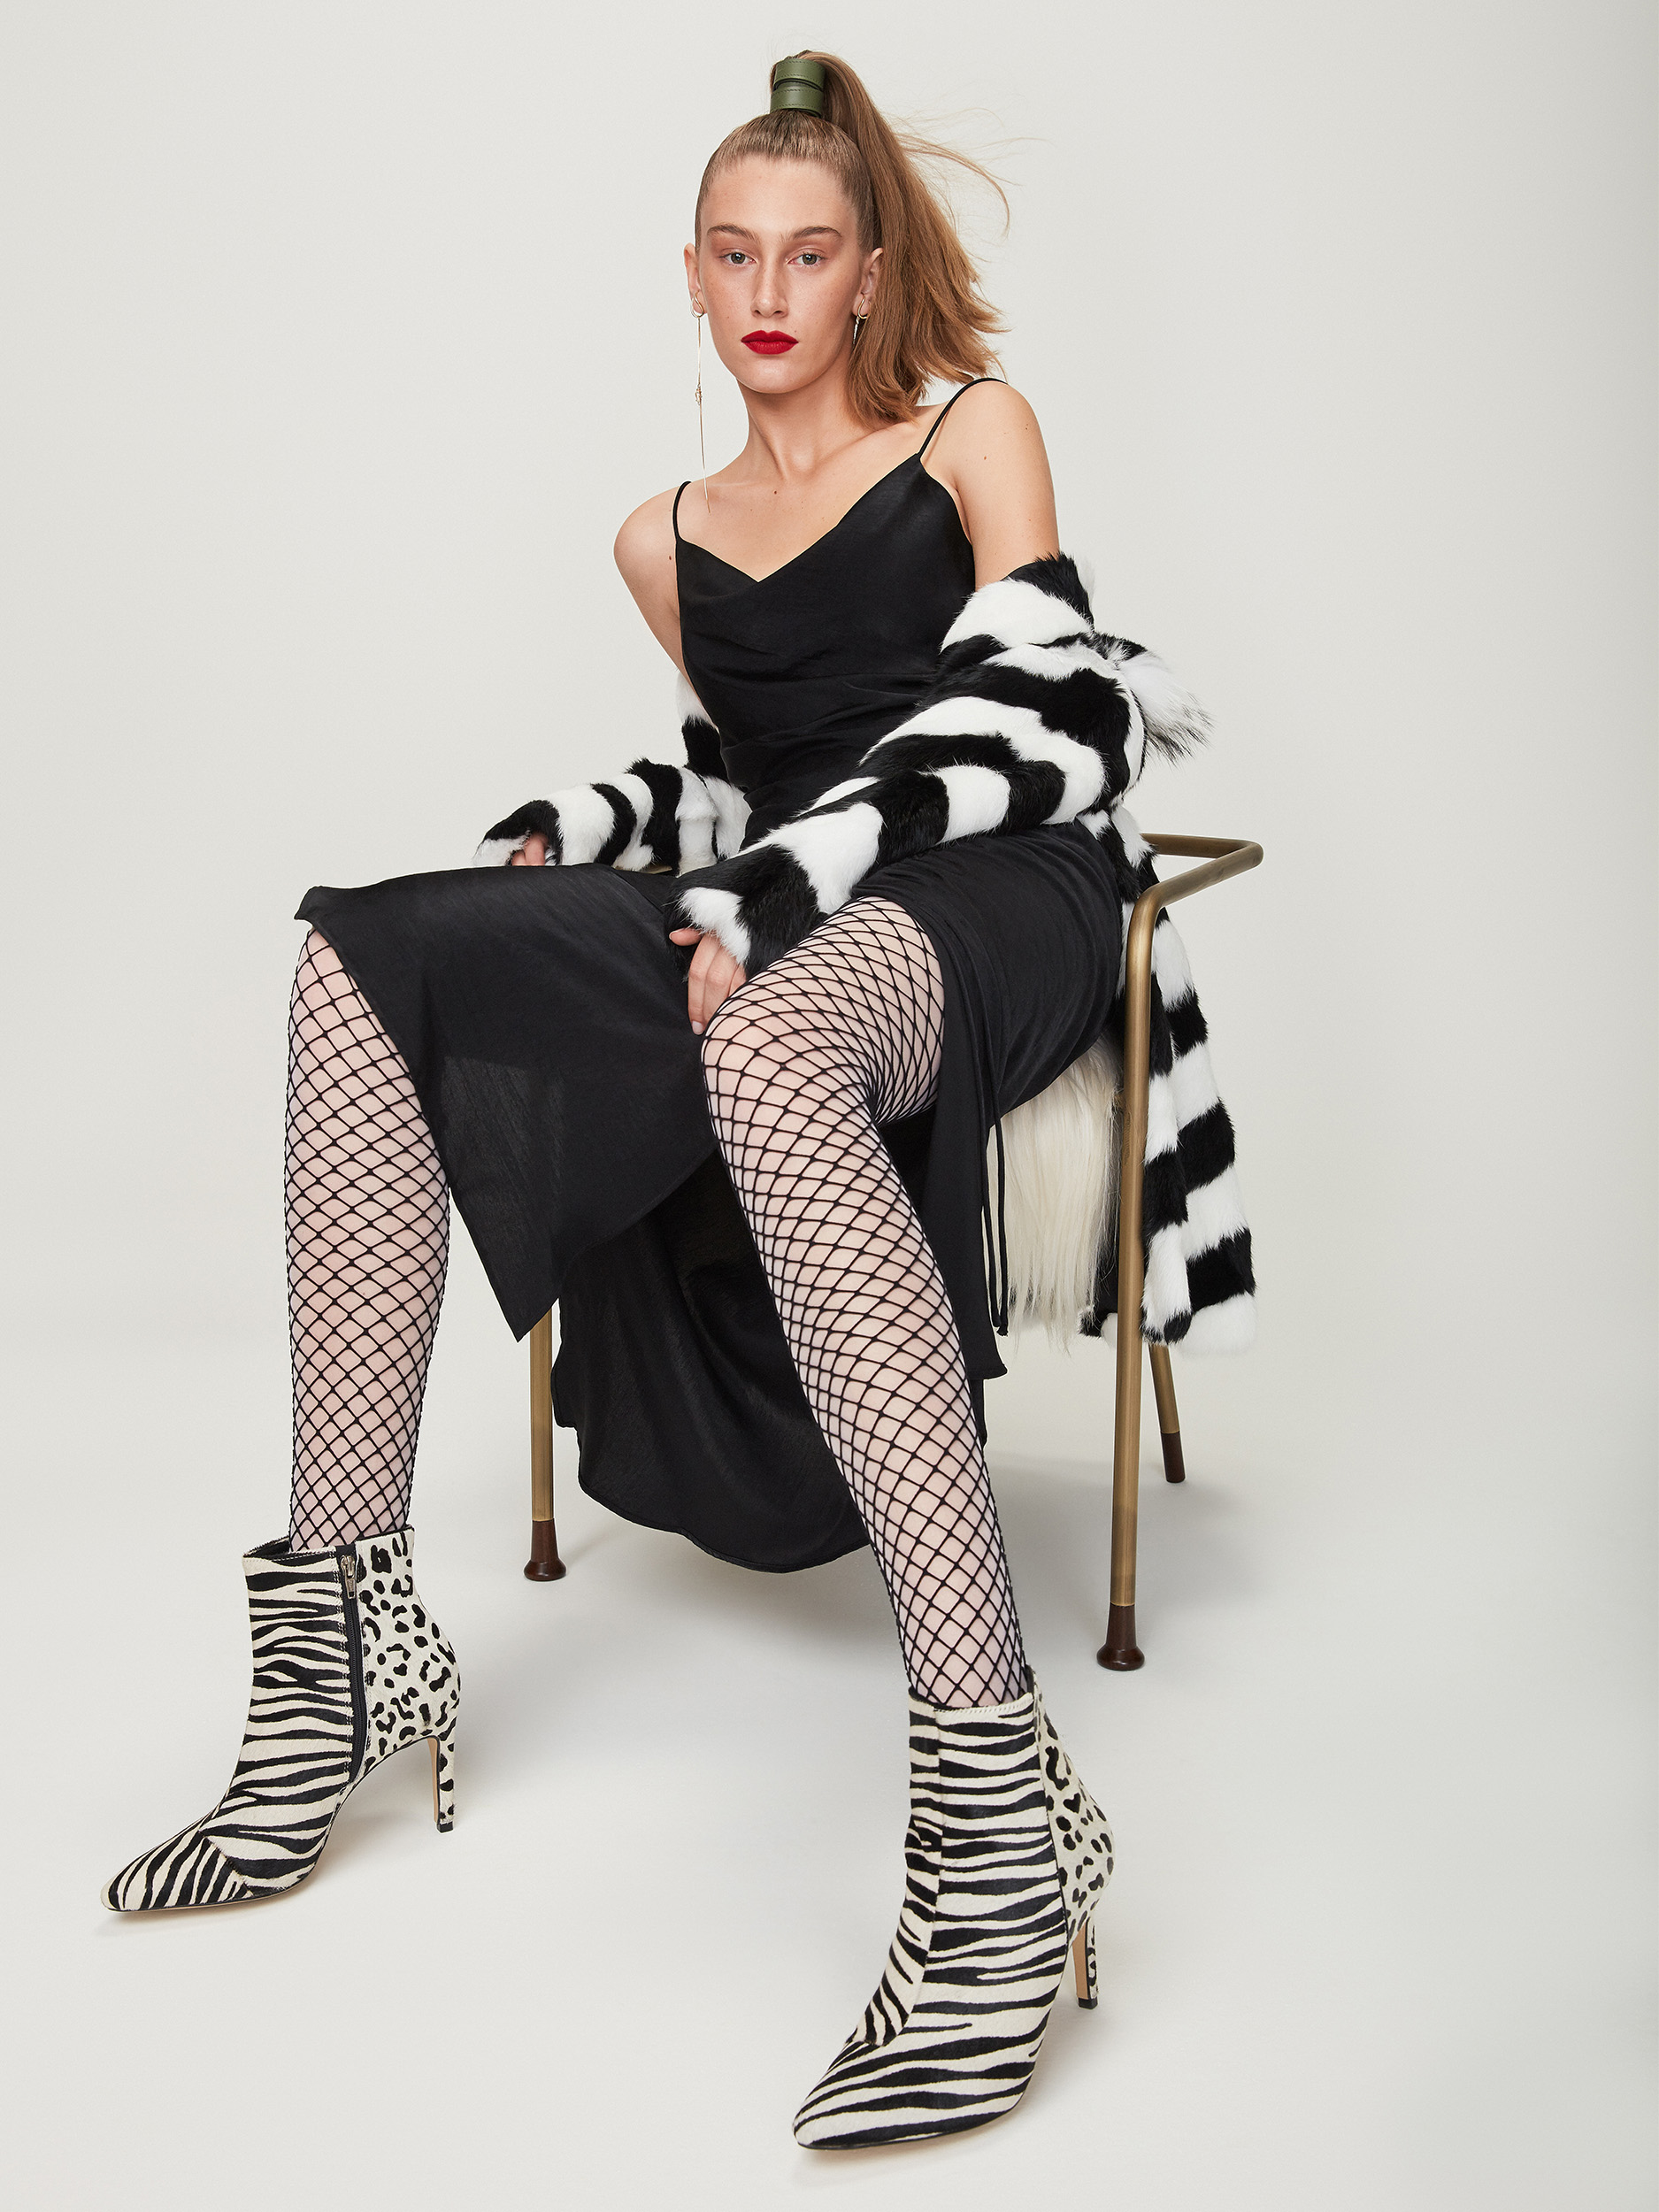 Vogue - Karla